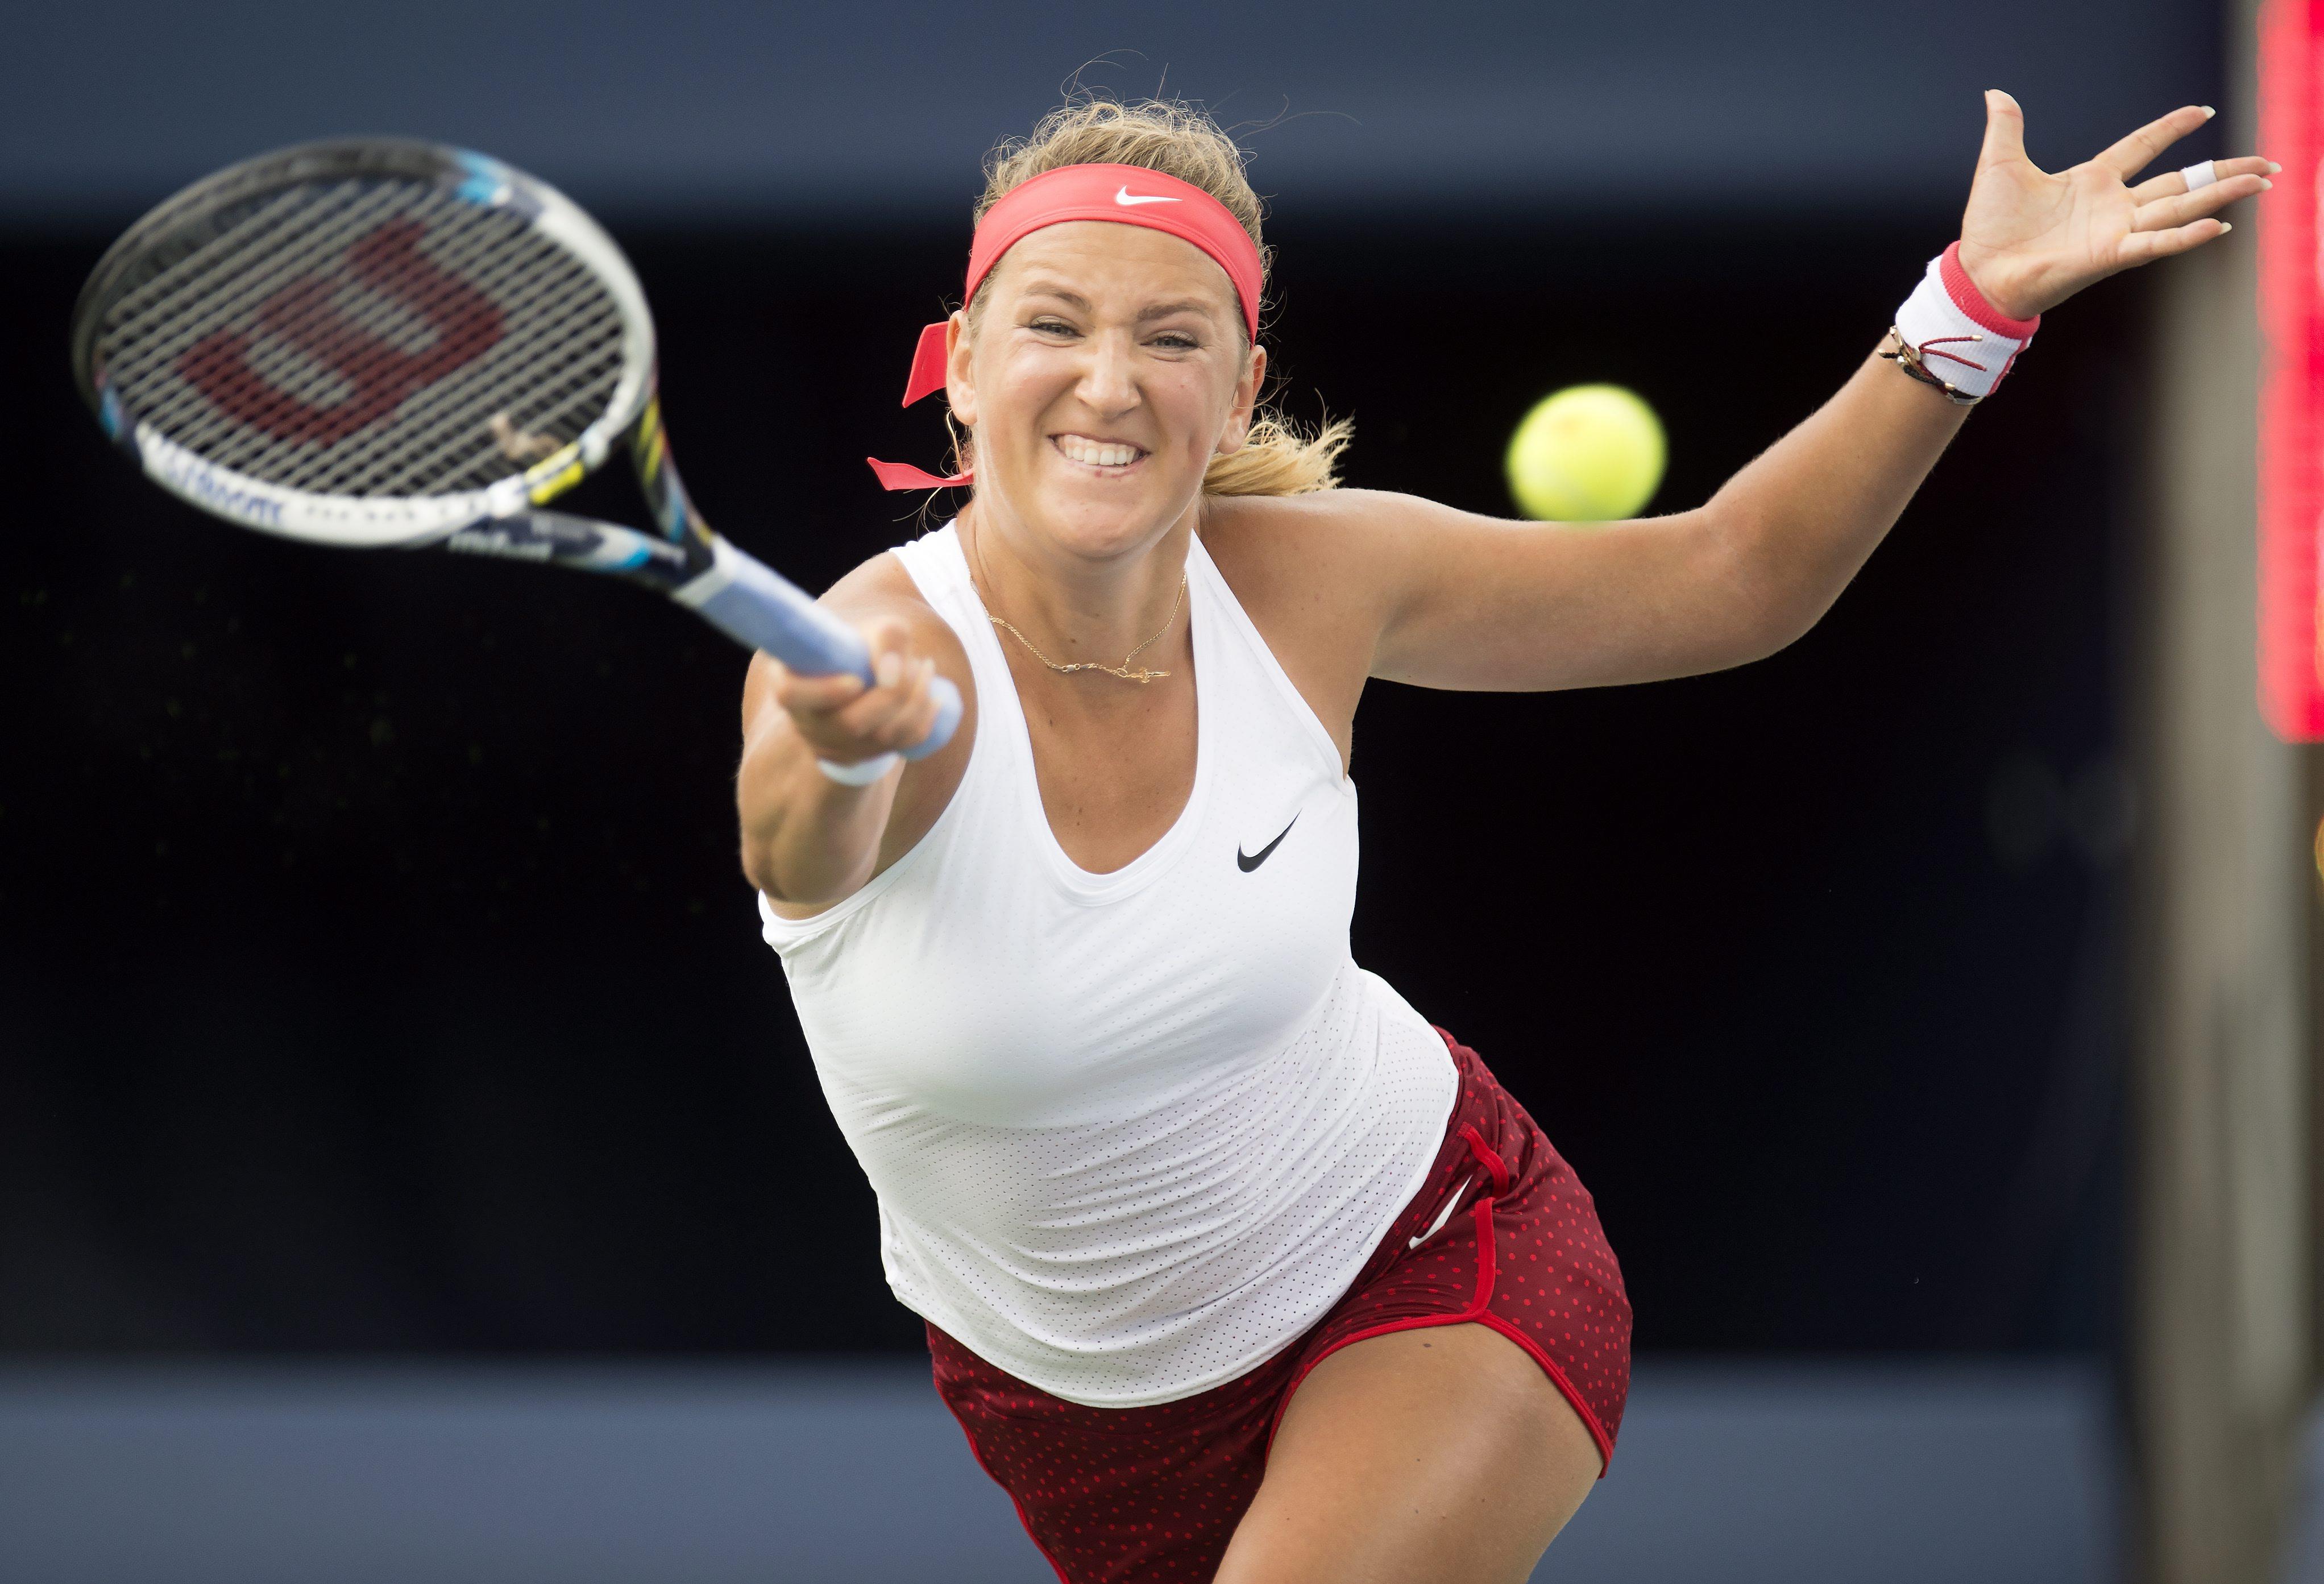 Victoria Azarenka, of Belarus, hits a return to Elina Svitolina, of Ukraine, at the Rogers Cup tennis tournament in Toronto, Tuesday Aug. 11, 2015.  (Frank Gunn/The Canadian Press via AP)